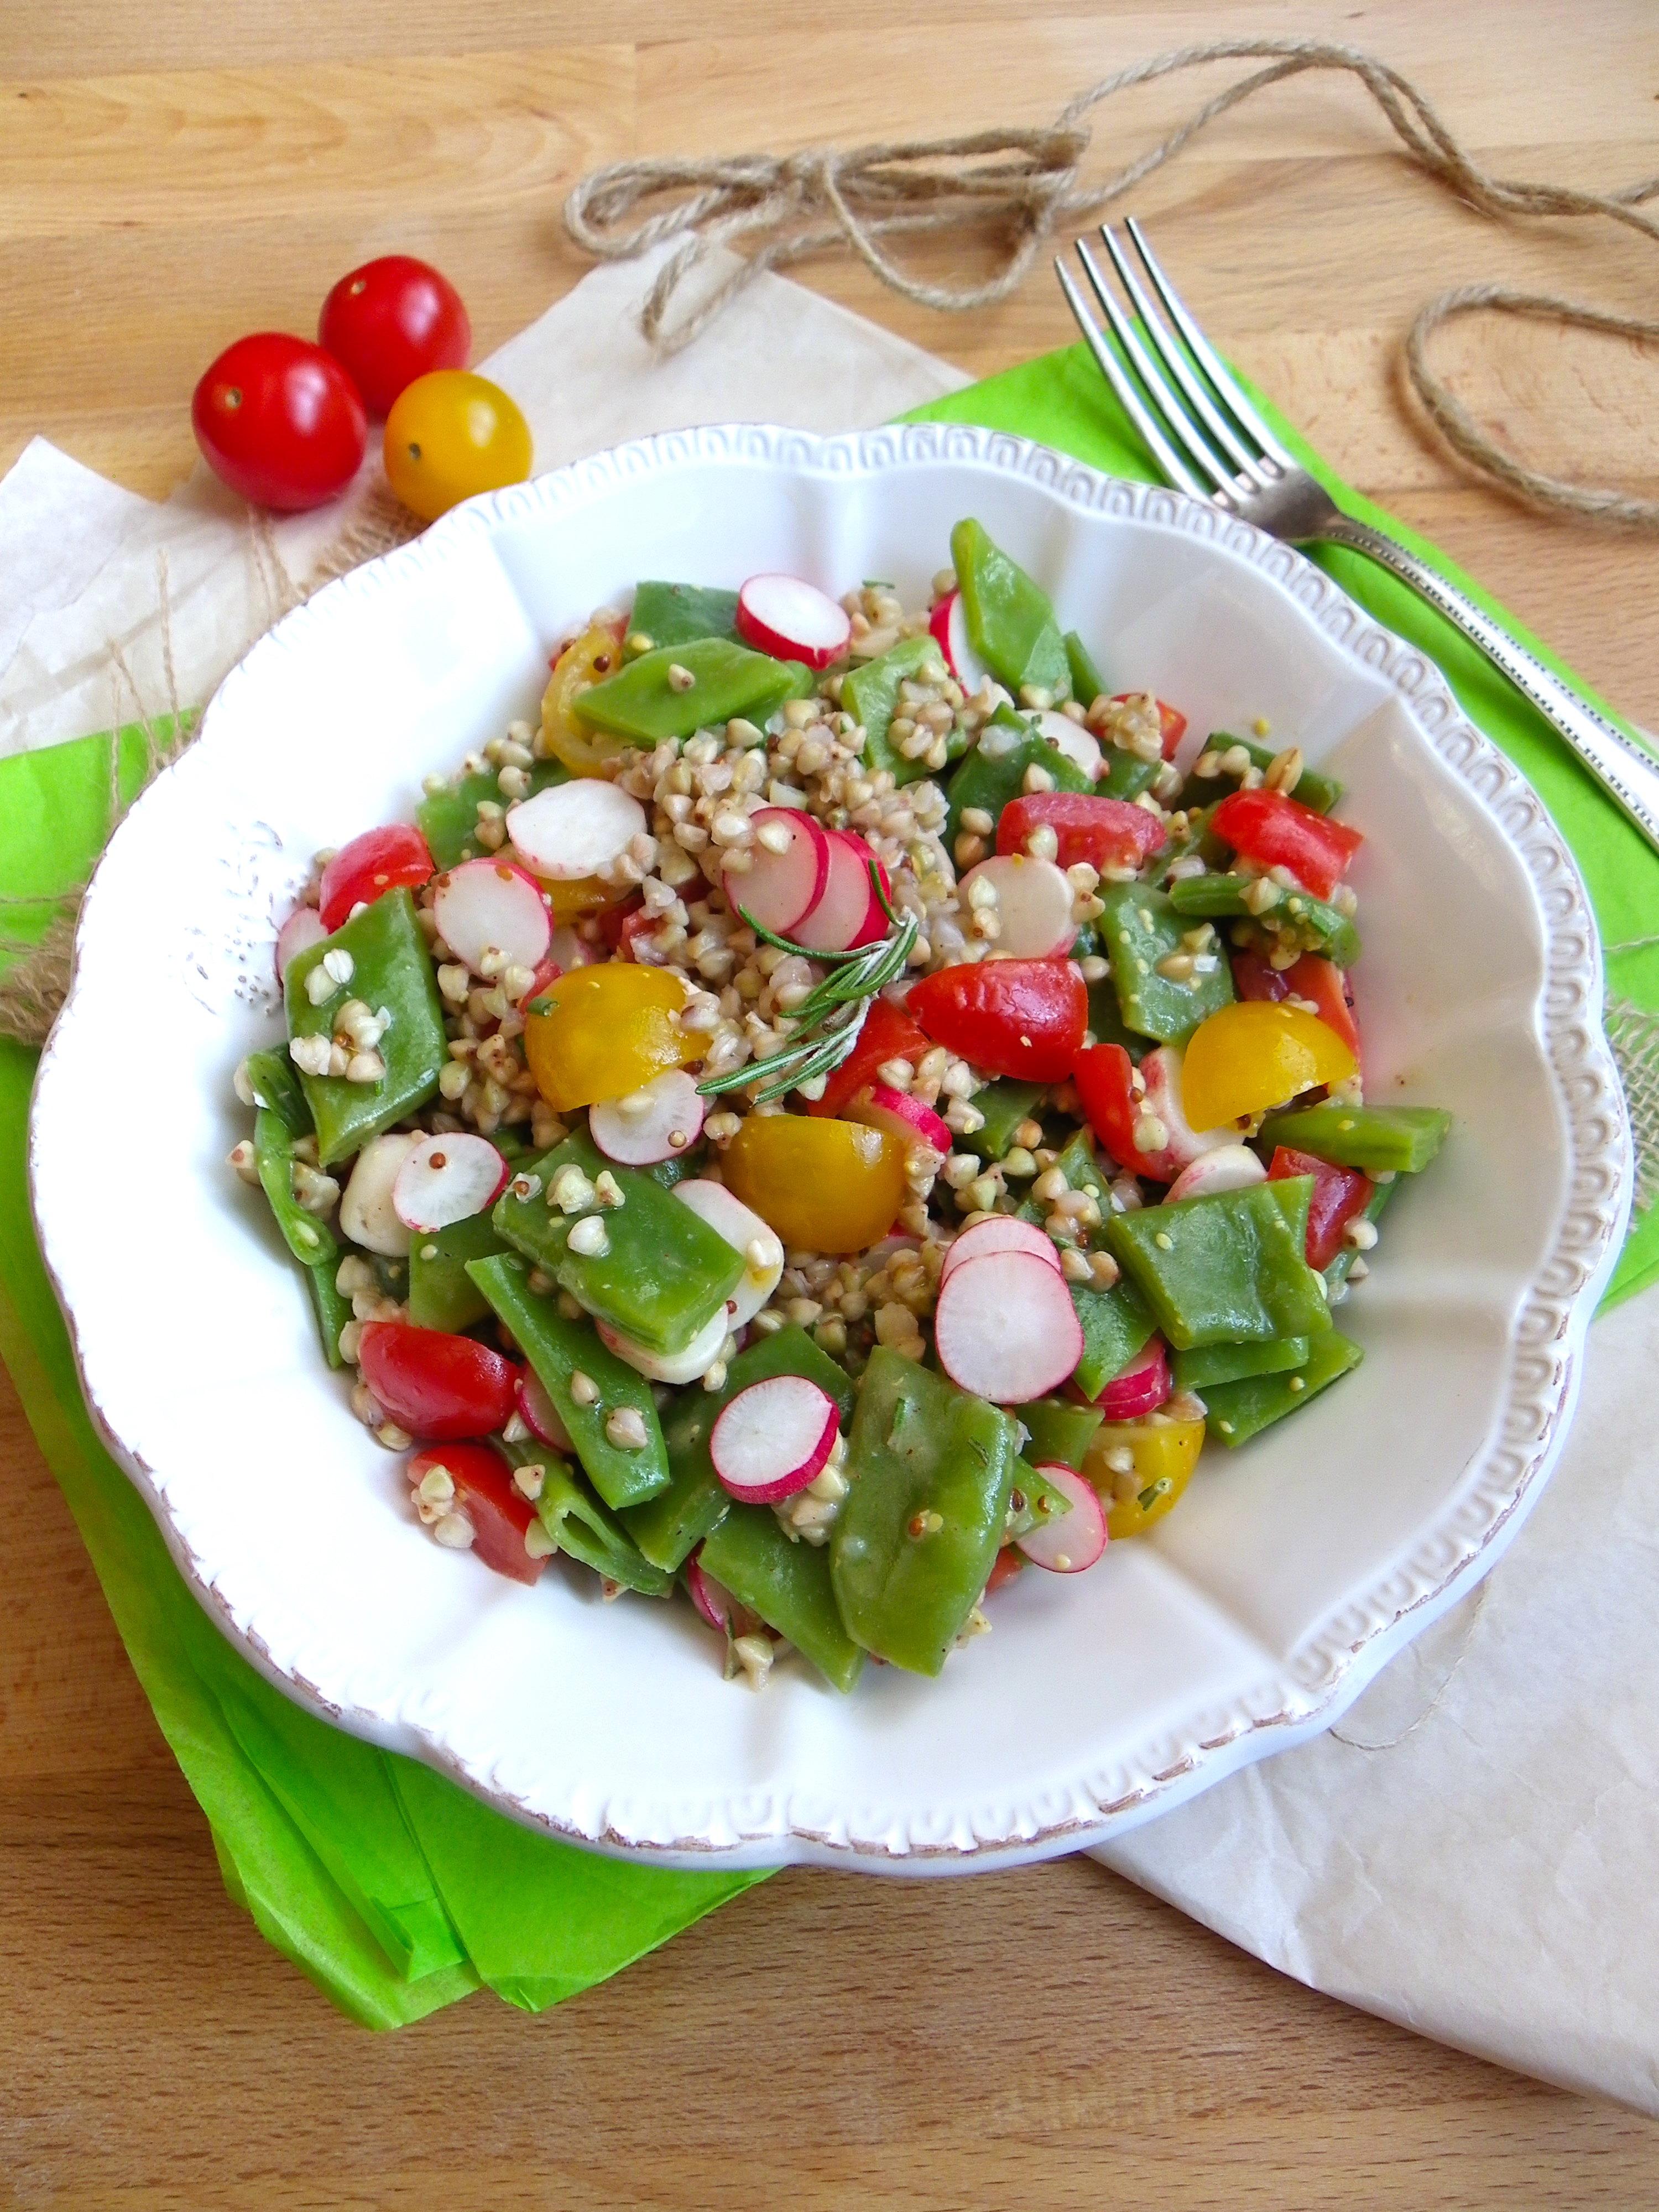 salade de sarrasin haricots plats tomates cerises et radis roses recette vegan pratique. Black Bedroom Furniture Sets. Home Design Ideas